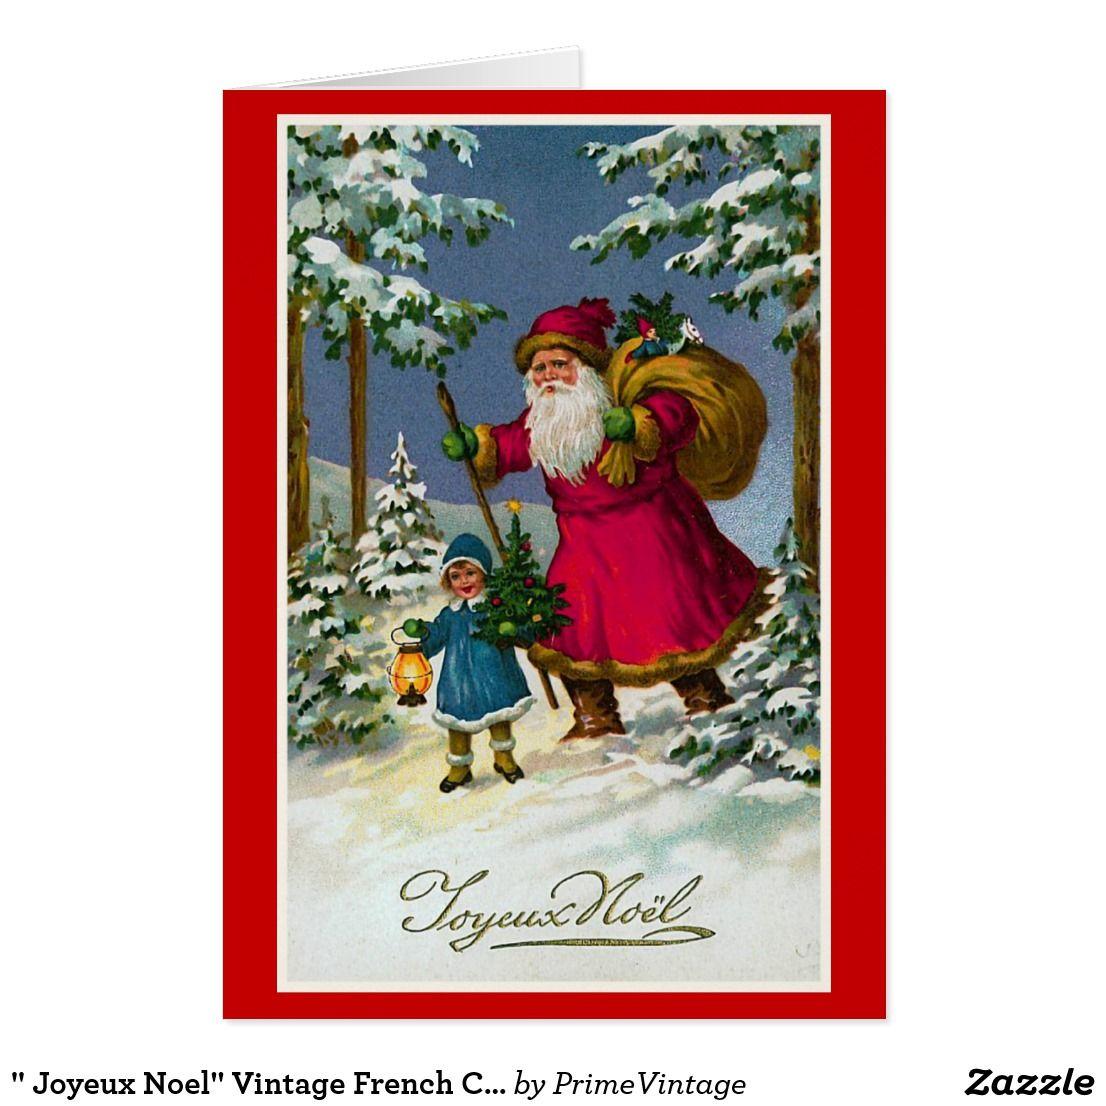 Joyeux noel vintage french christmas card joyeux noel vintage french christmas card m4hsunfo Images